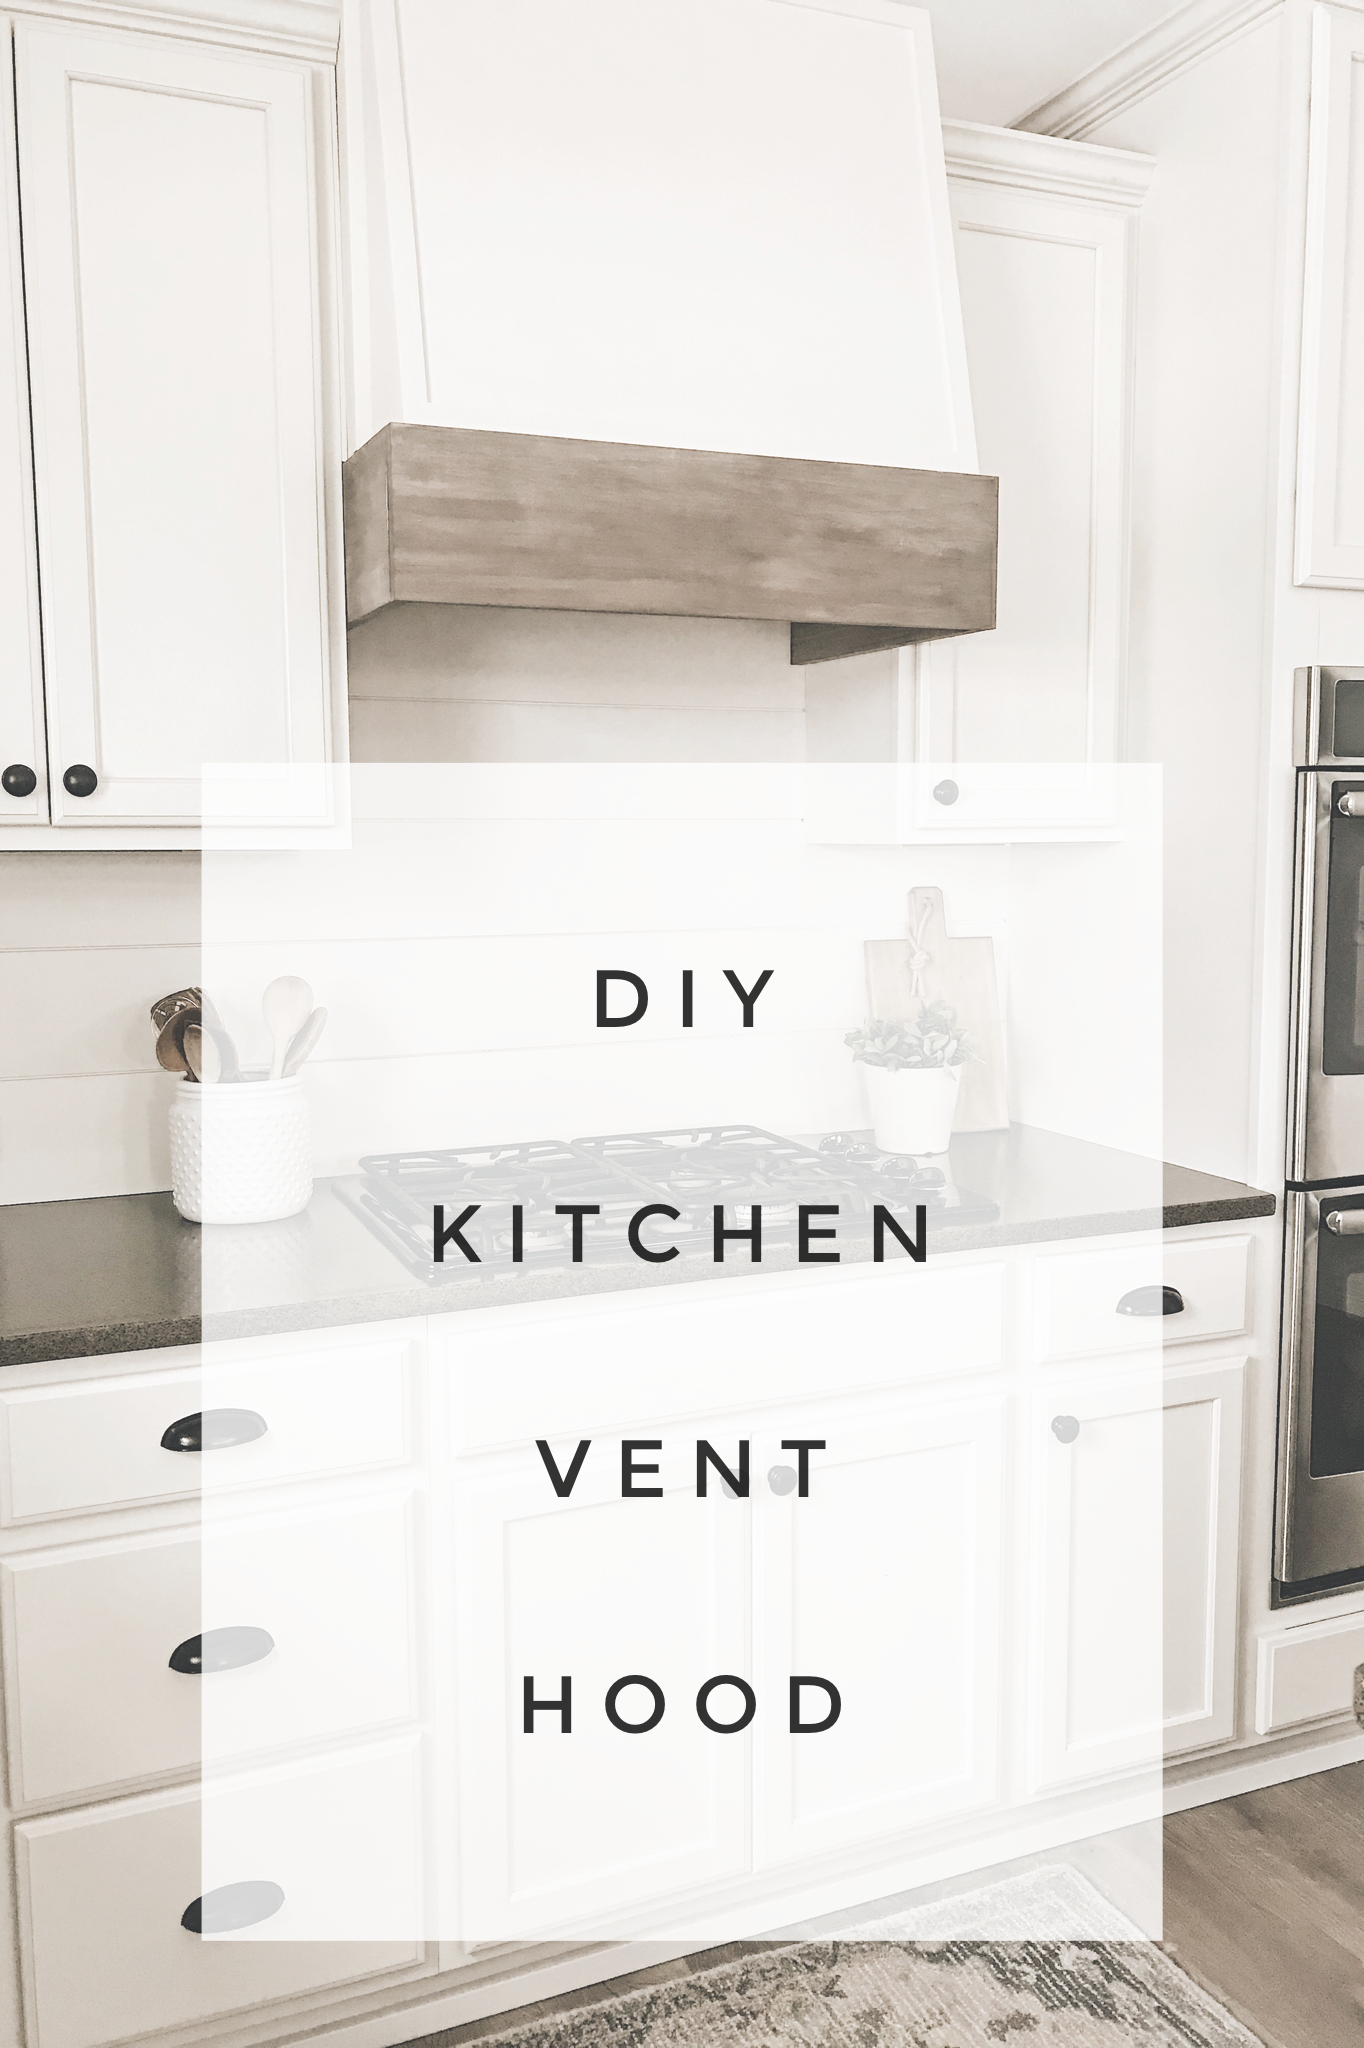 Diy Kitchen Vent Hood Kitchen Vent Hood Kitchen Vent Farmhouse Kitchen Cabinets